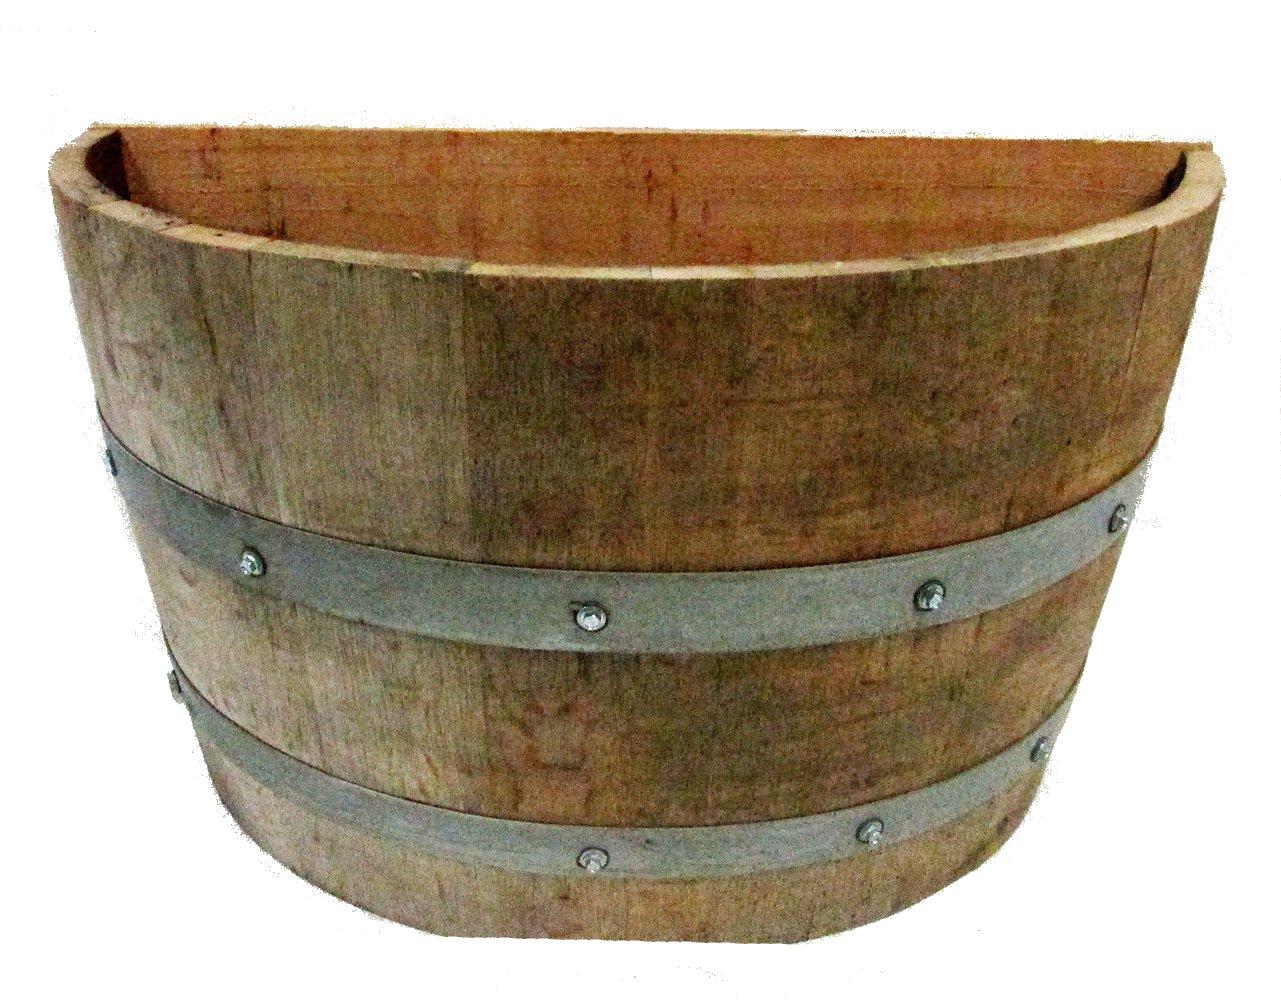 "MGP Oak Wood Qarter Wine Barrel Planter Handcrafted from Used Wine Barrels, 26"" W x 14"" D x 18"" H"